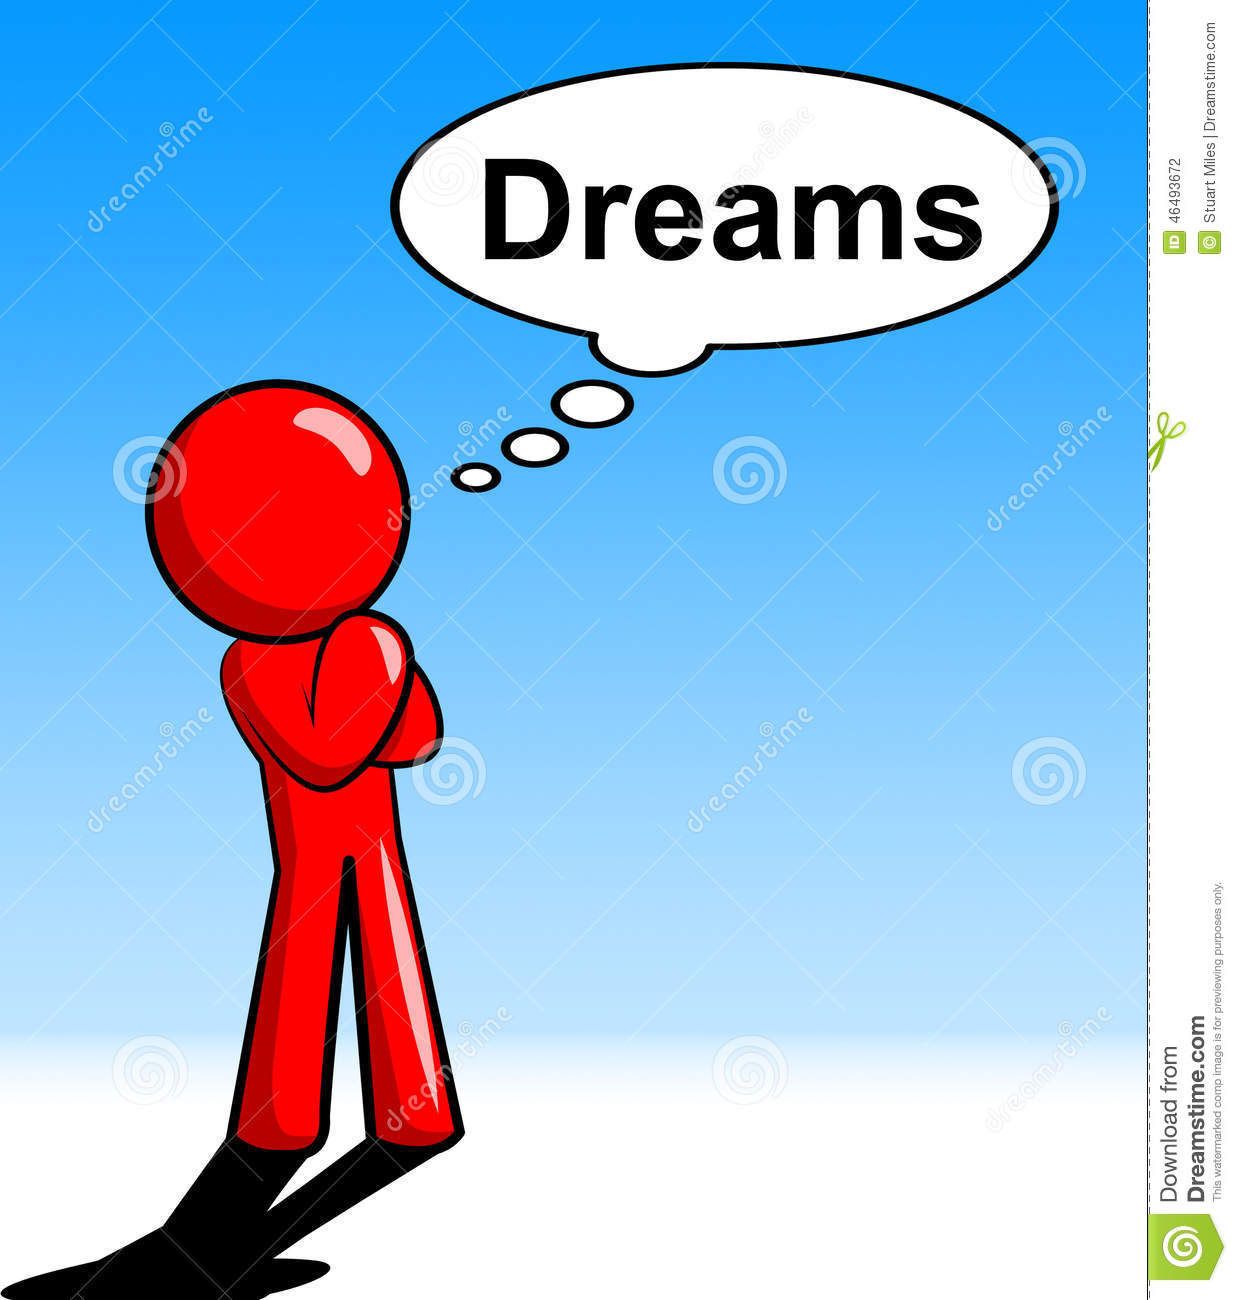 Daydreamer Stock Illustrations.